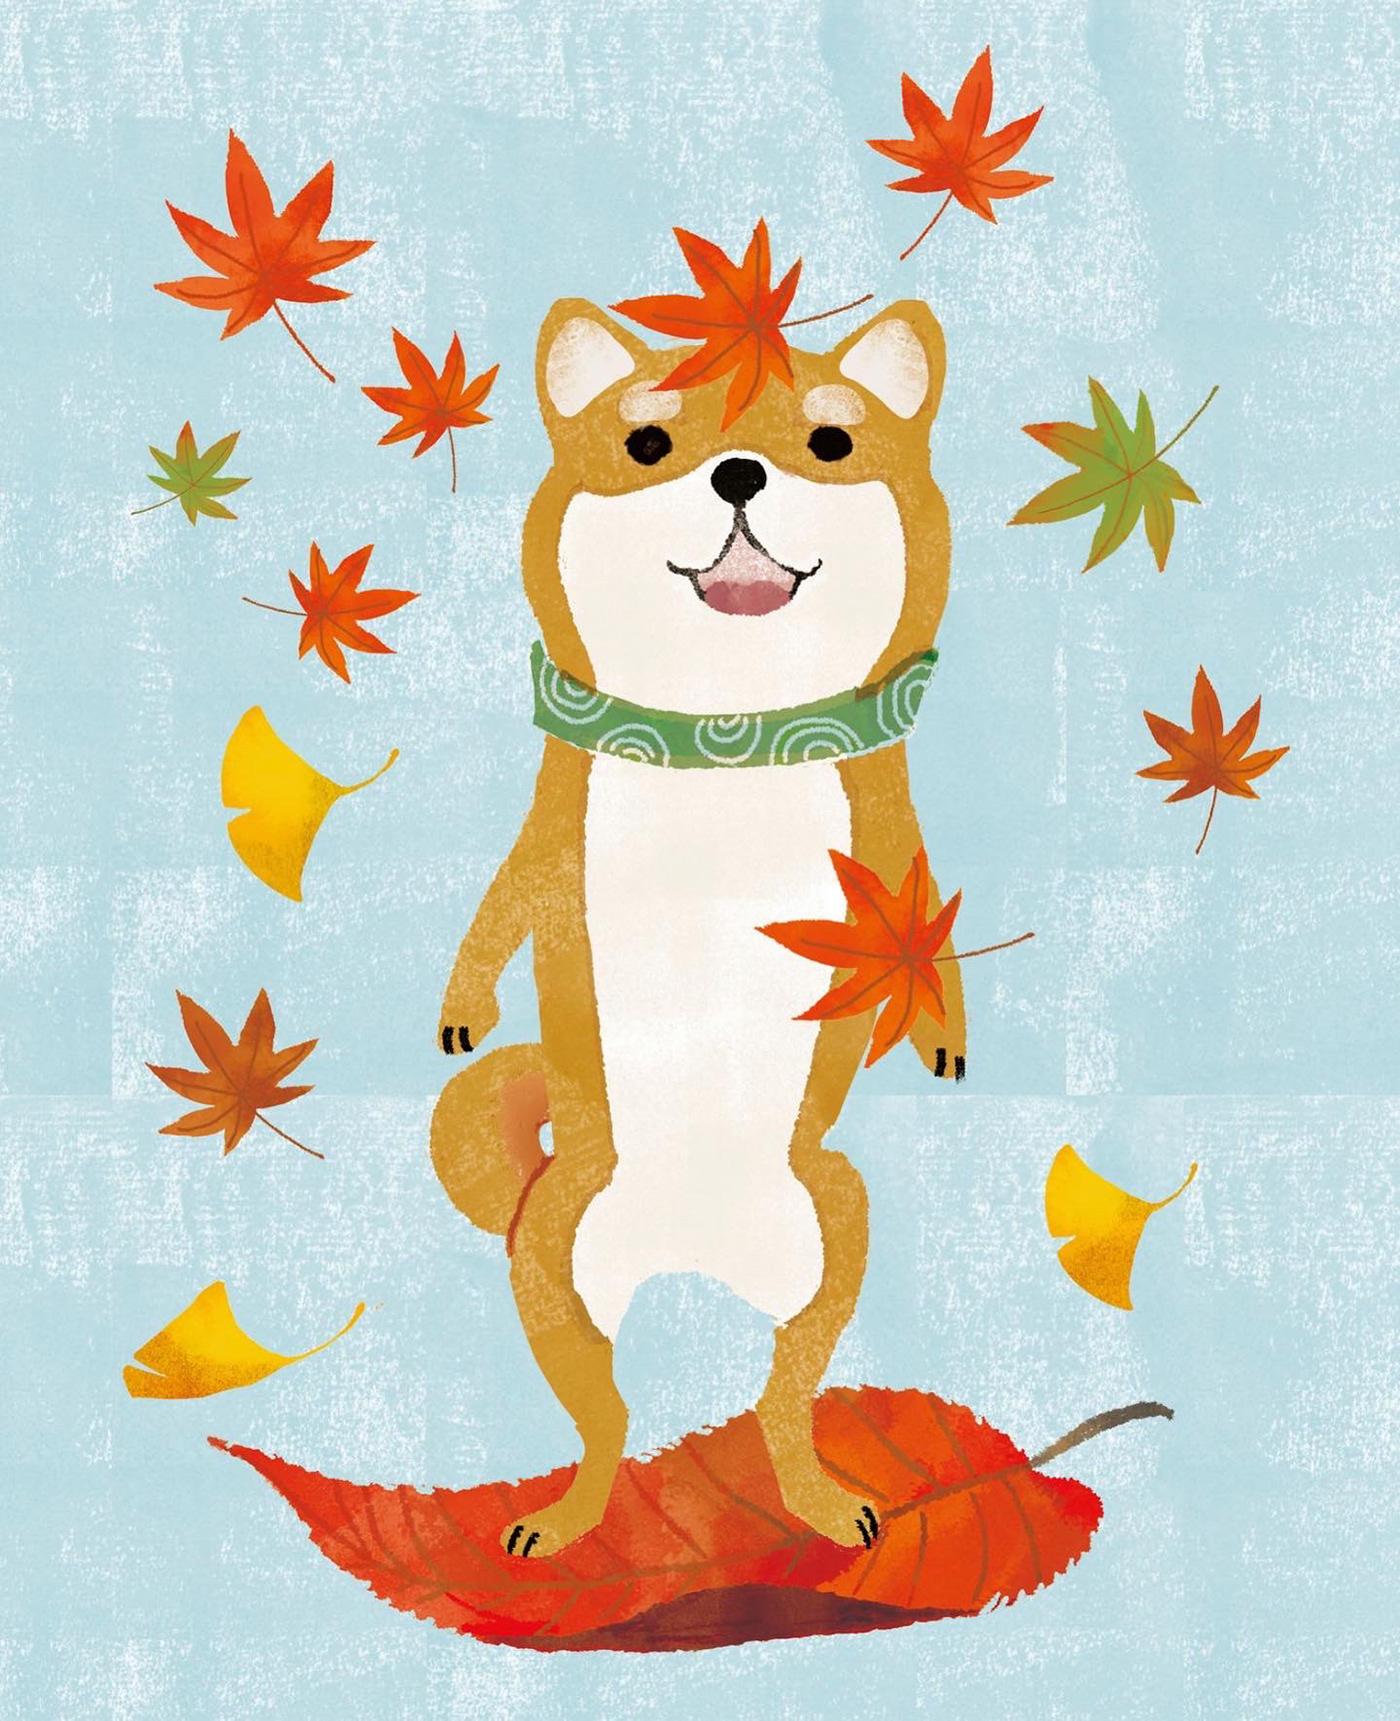 animal book book cover illustration children dog kids book shibainu イヌ 動物 挿画 柴犬 装丁画